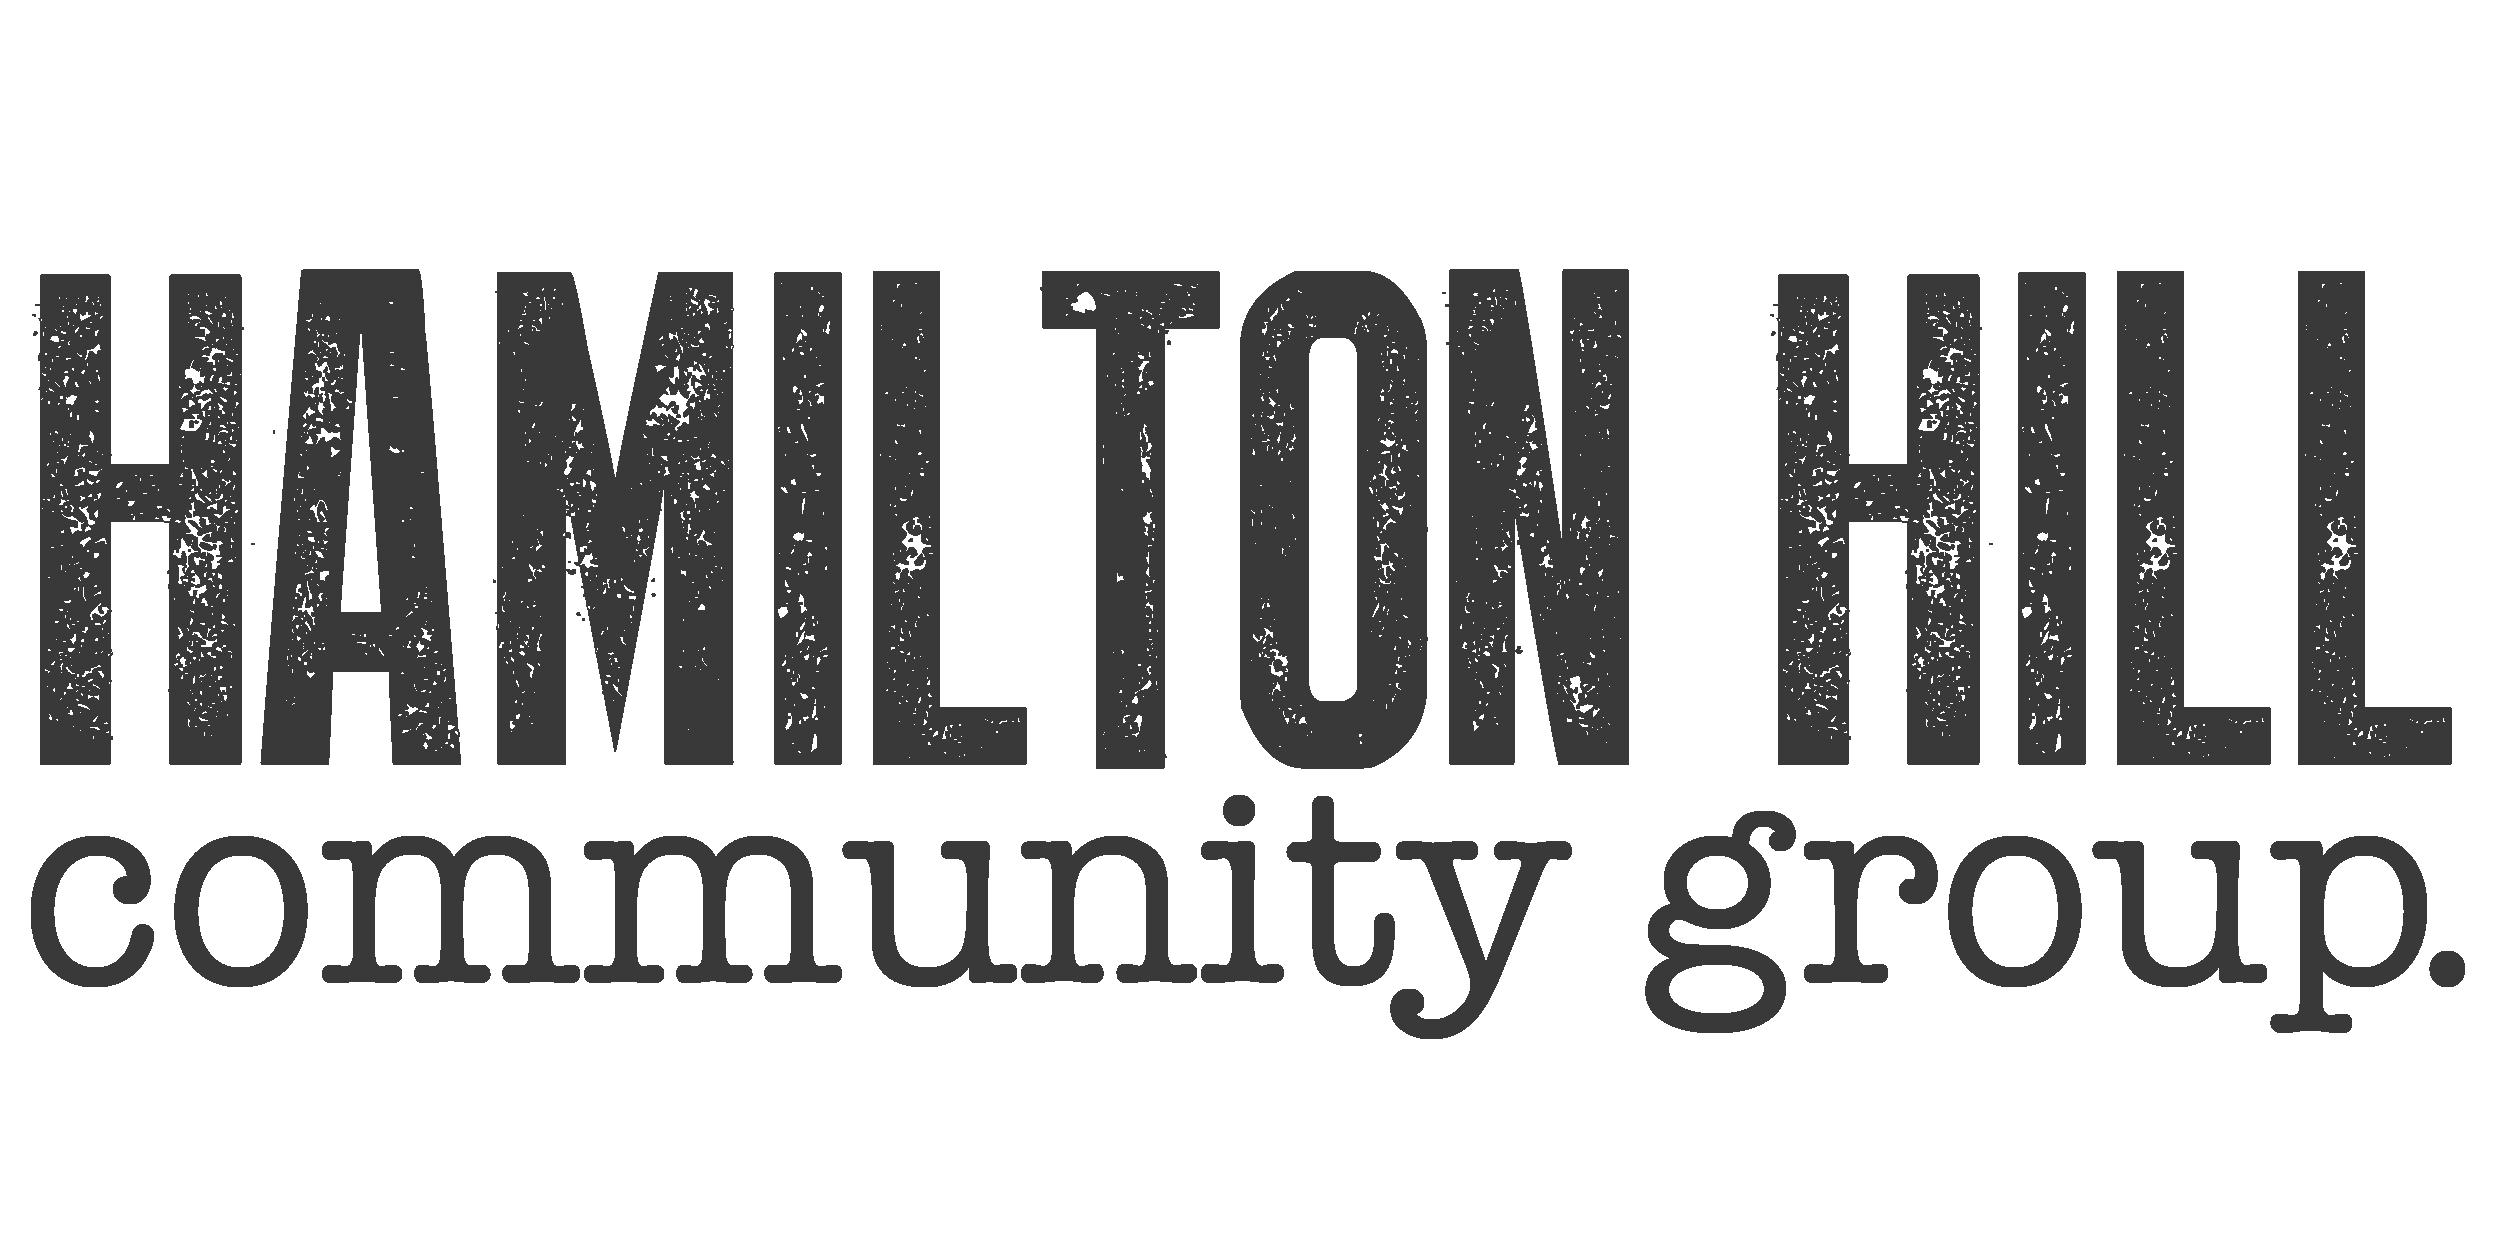 Building Community.